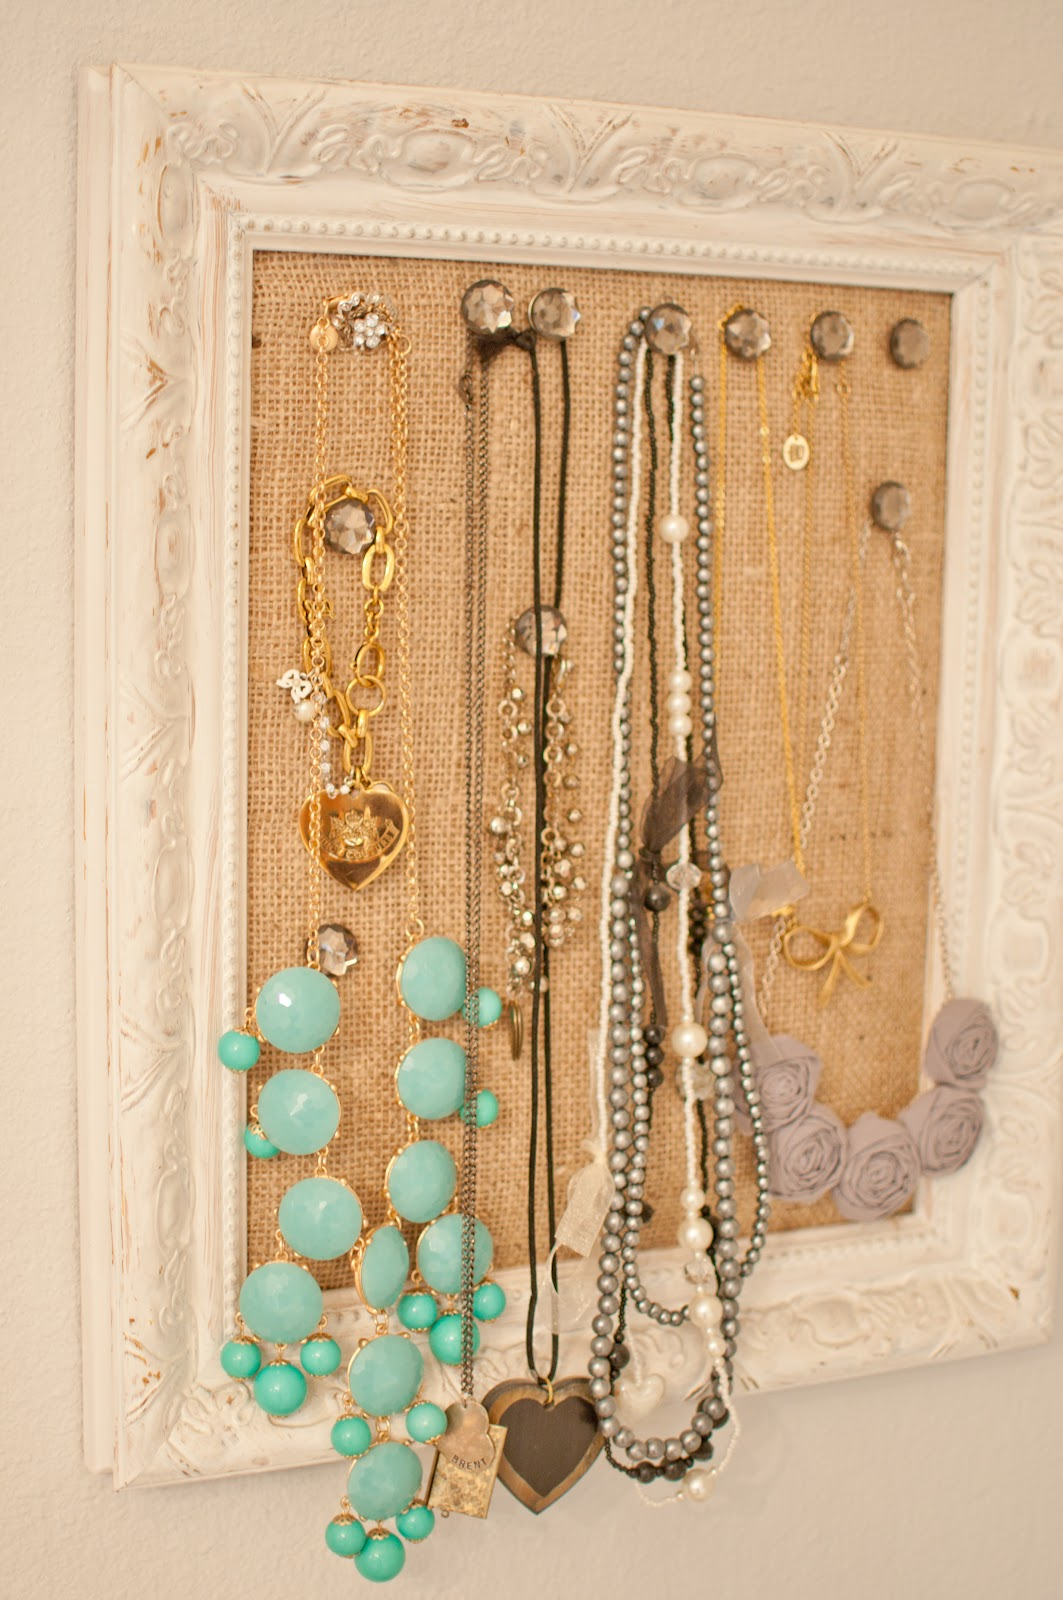 Domestic fashionista diy cork board jewelry frame solutioingenieria Images